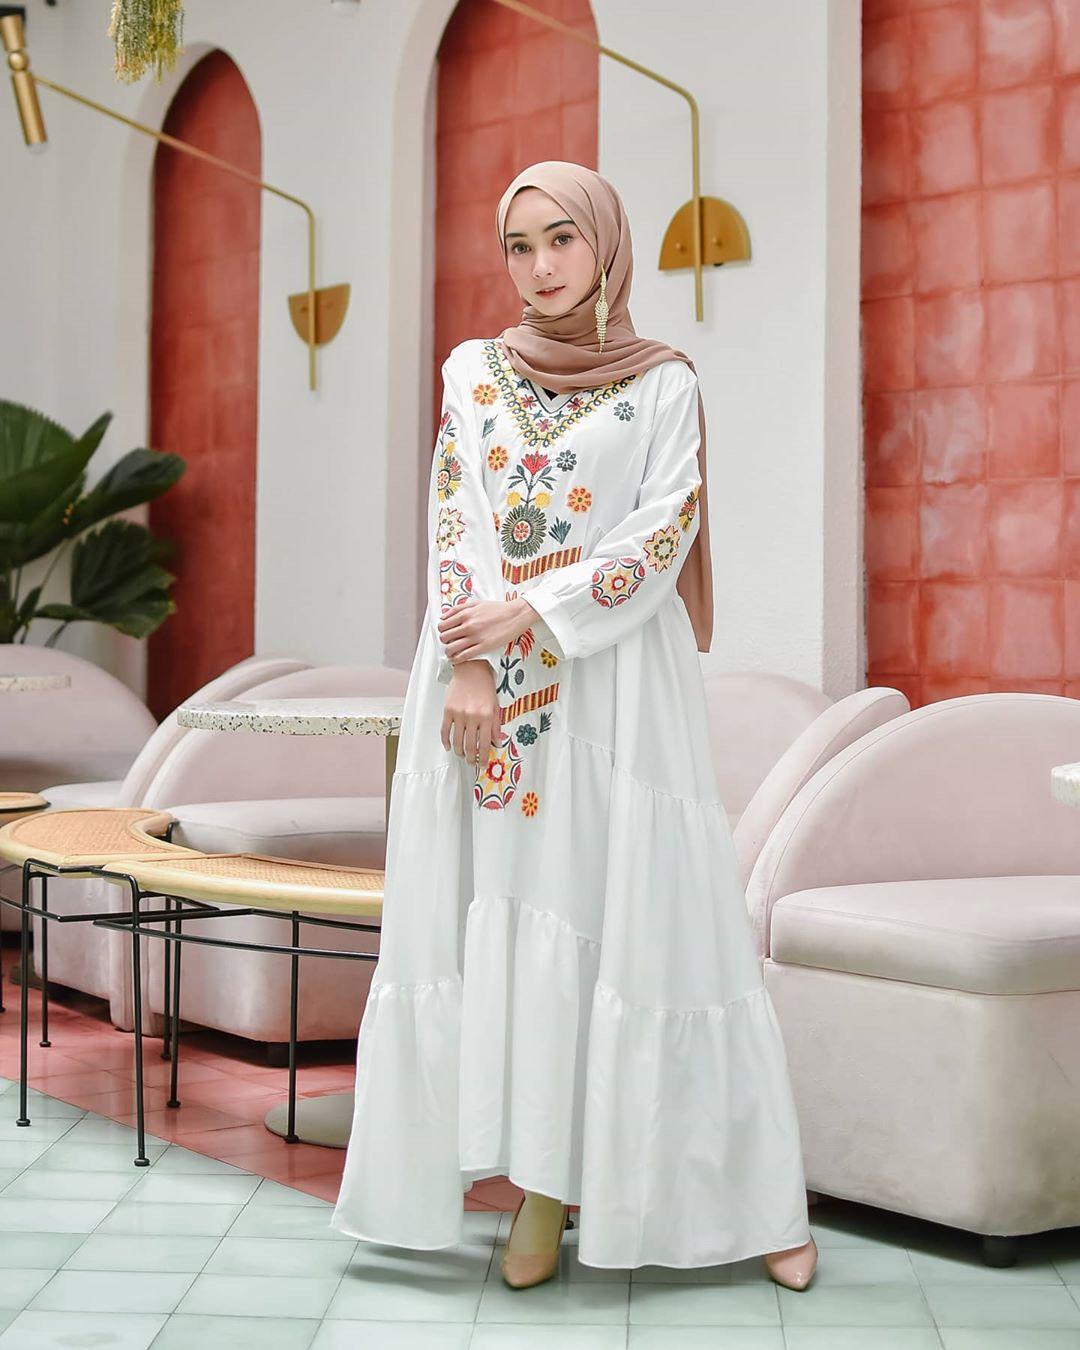 (Realpict - FREE ciput premium) NS Adreanna Dress Wanita Muslim Wanita Terbaru 2020 Kaftan dan Abaya Jumbo Size S to XL Gamis Terbaru 2020 Modern Ramadhani Dress